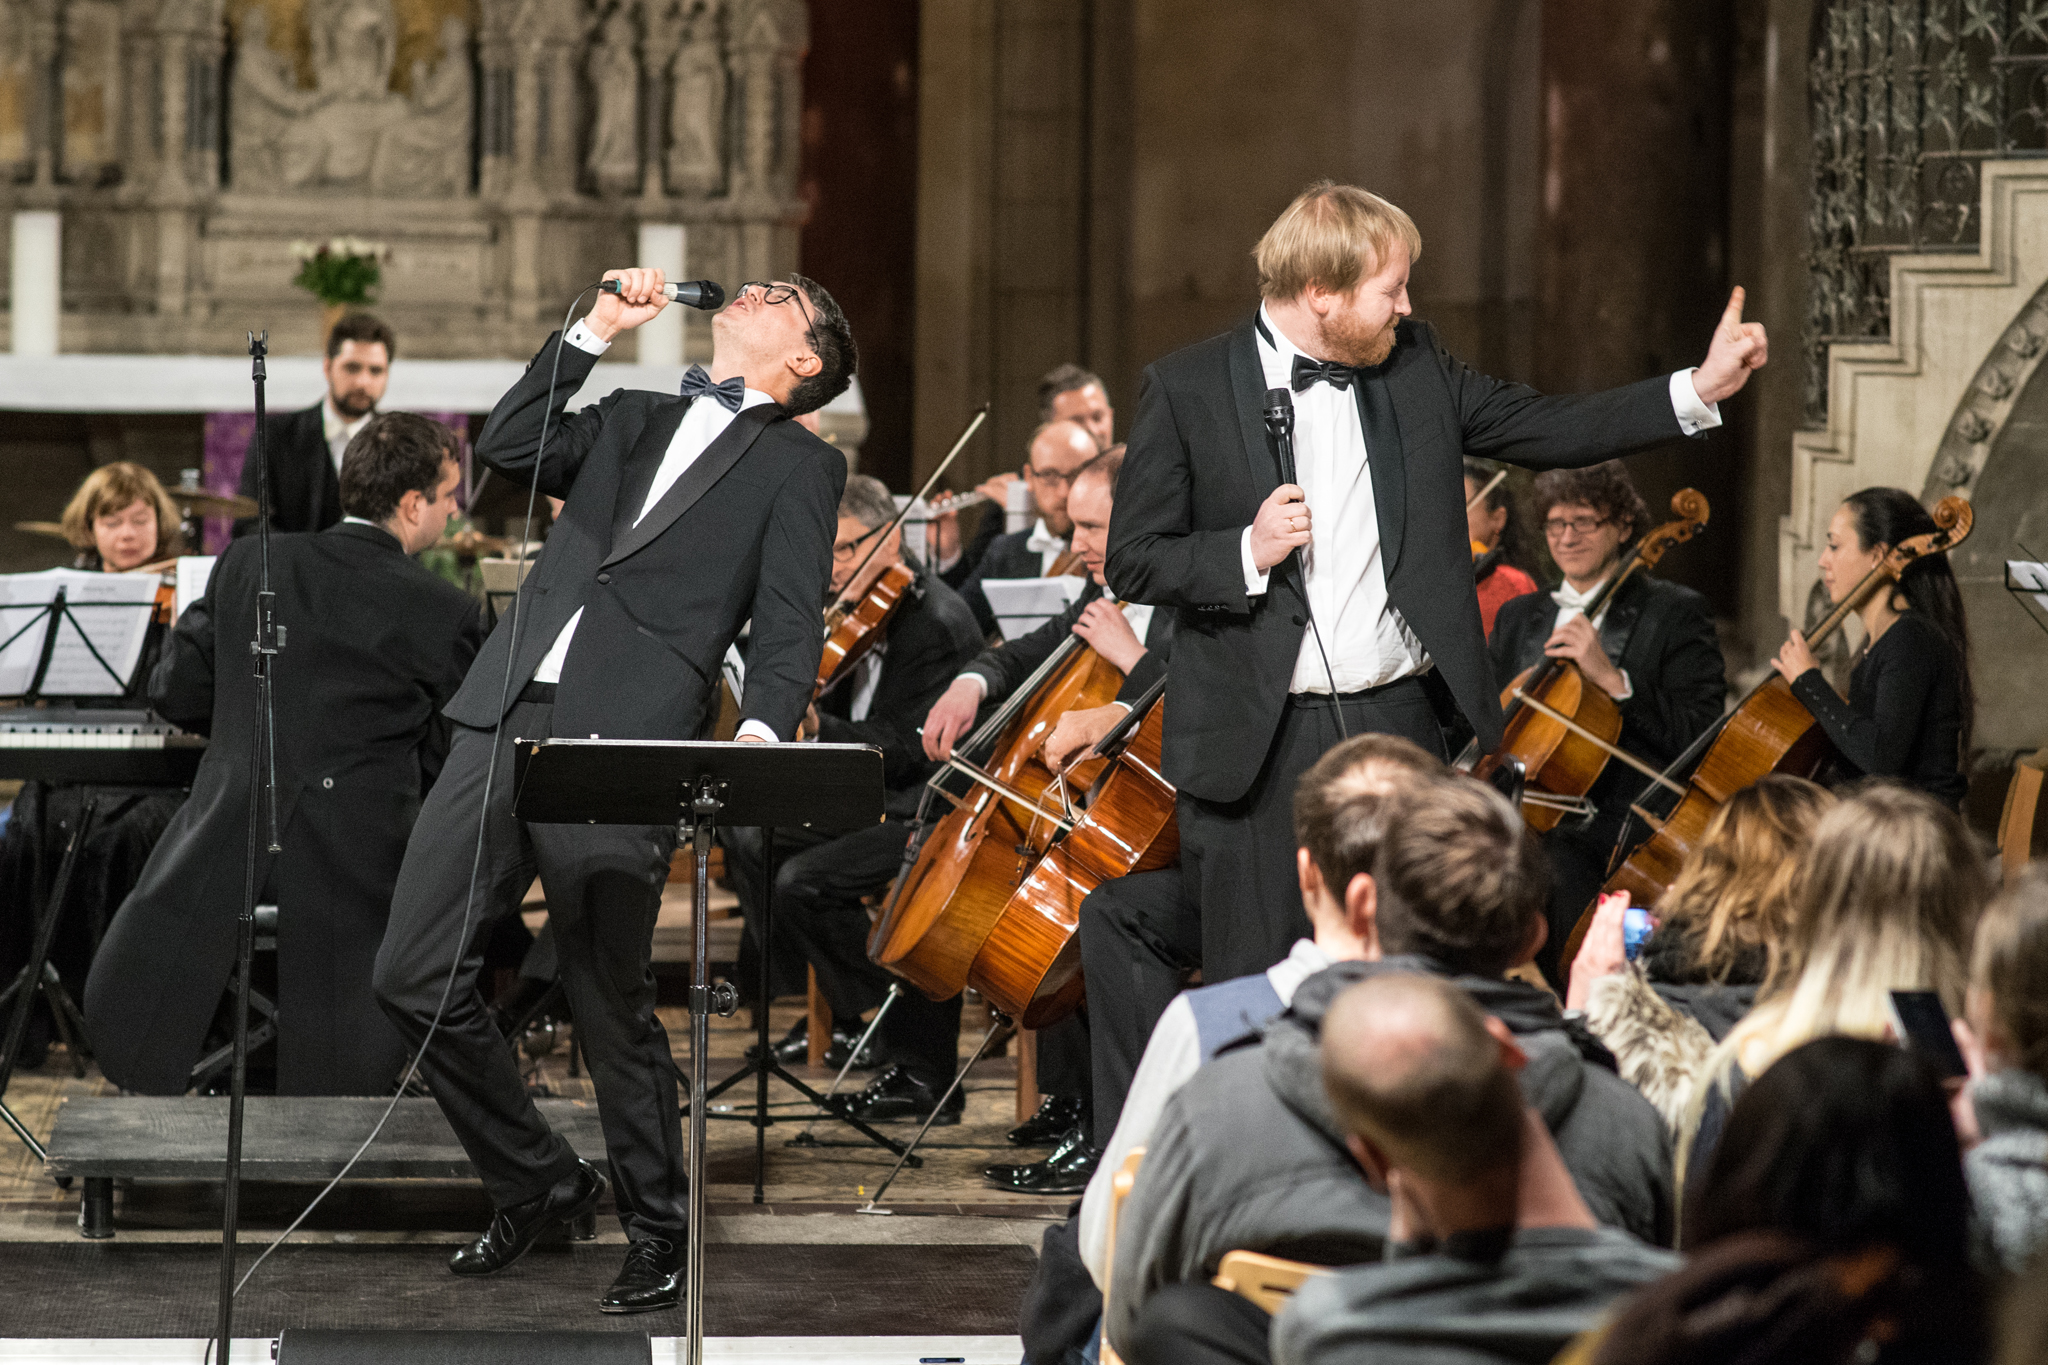 Preview: The Fuck Hornisschen Orchestra